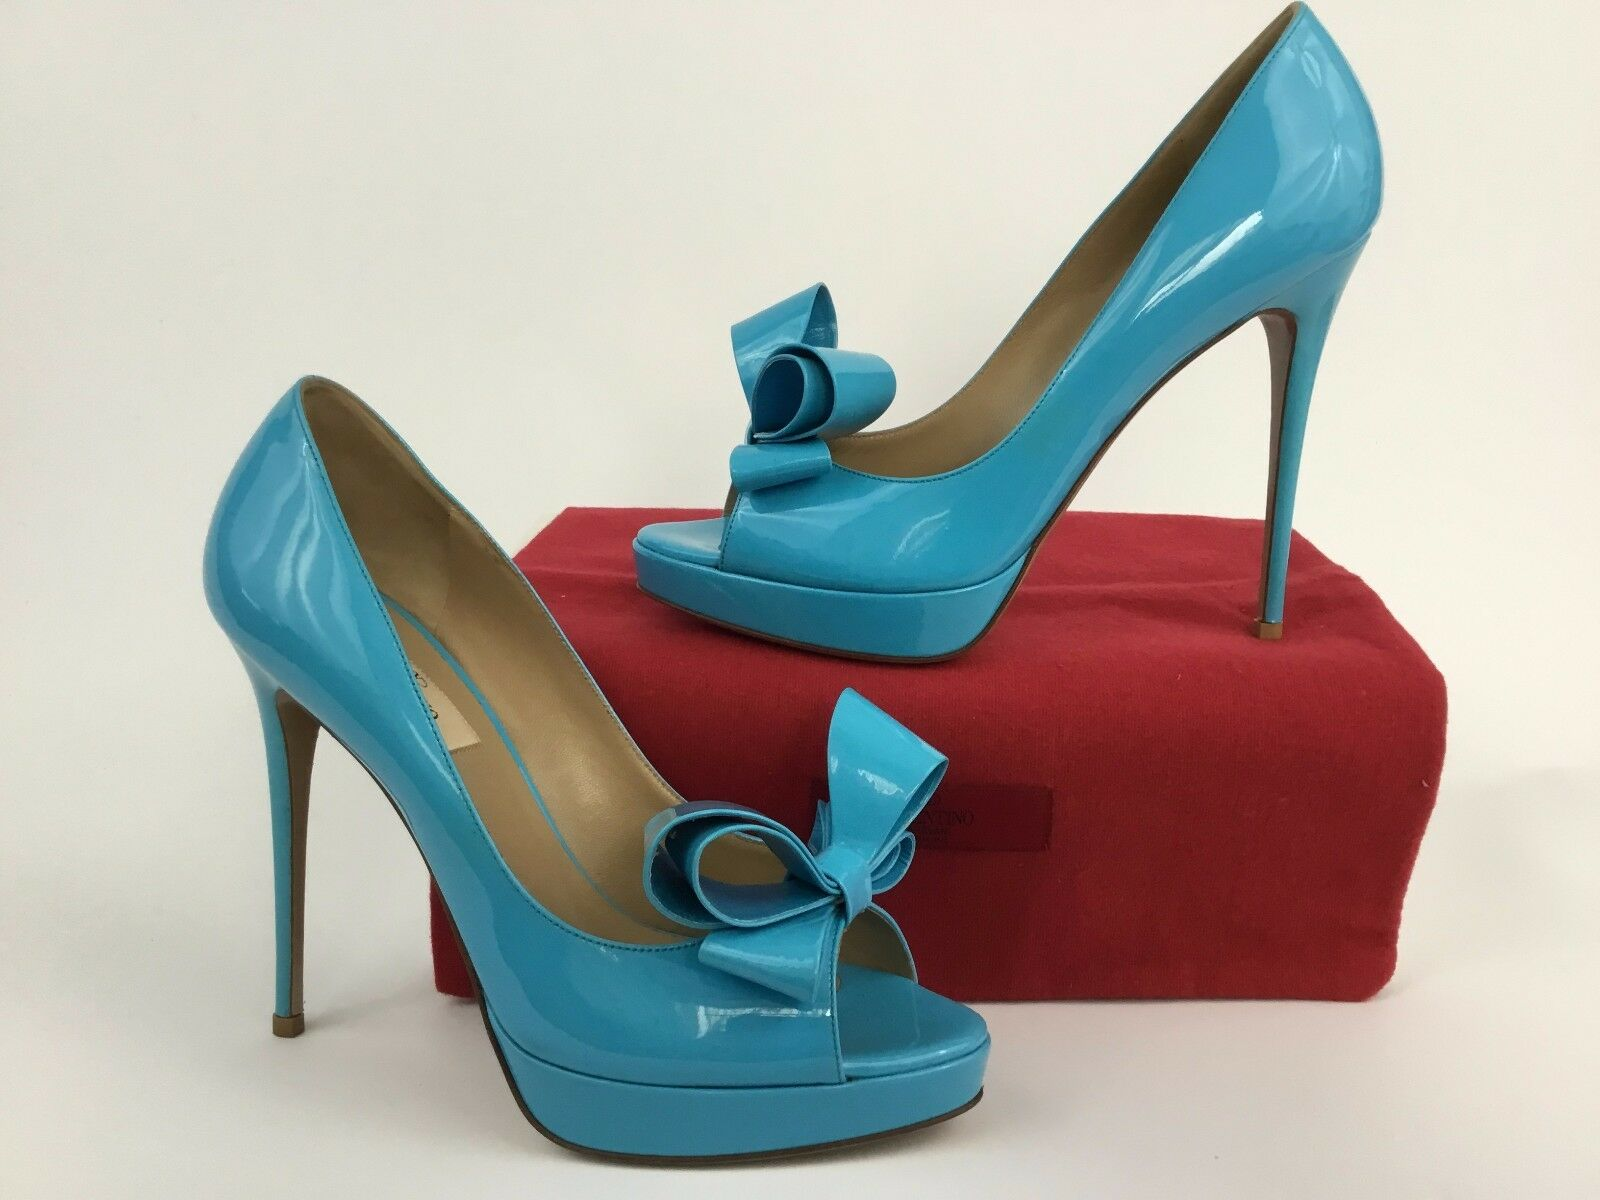 Valentino Garavani Bow Peep Toe Toe Toe Blau Patent Leather Platform Pump 39.5 2c7c0b